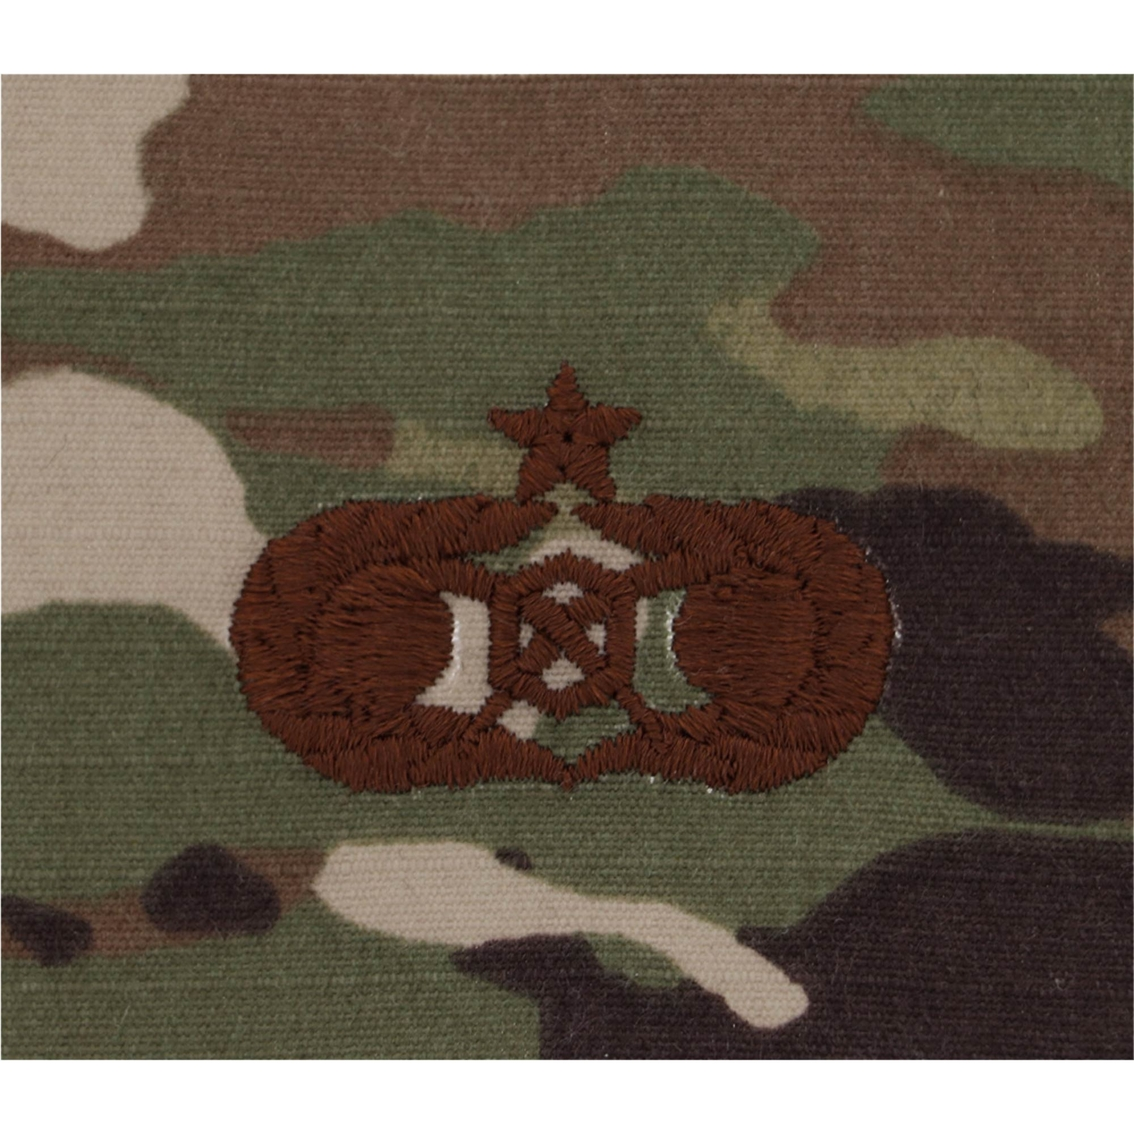 Air Force Badge Civil Engineer Readiness Senior, Sew-on (ocp